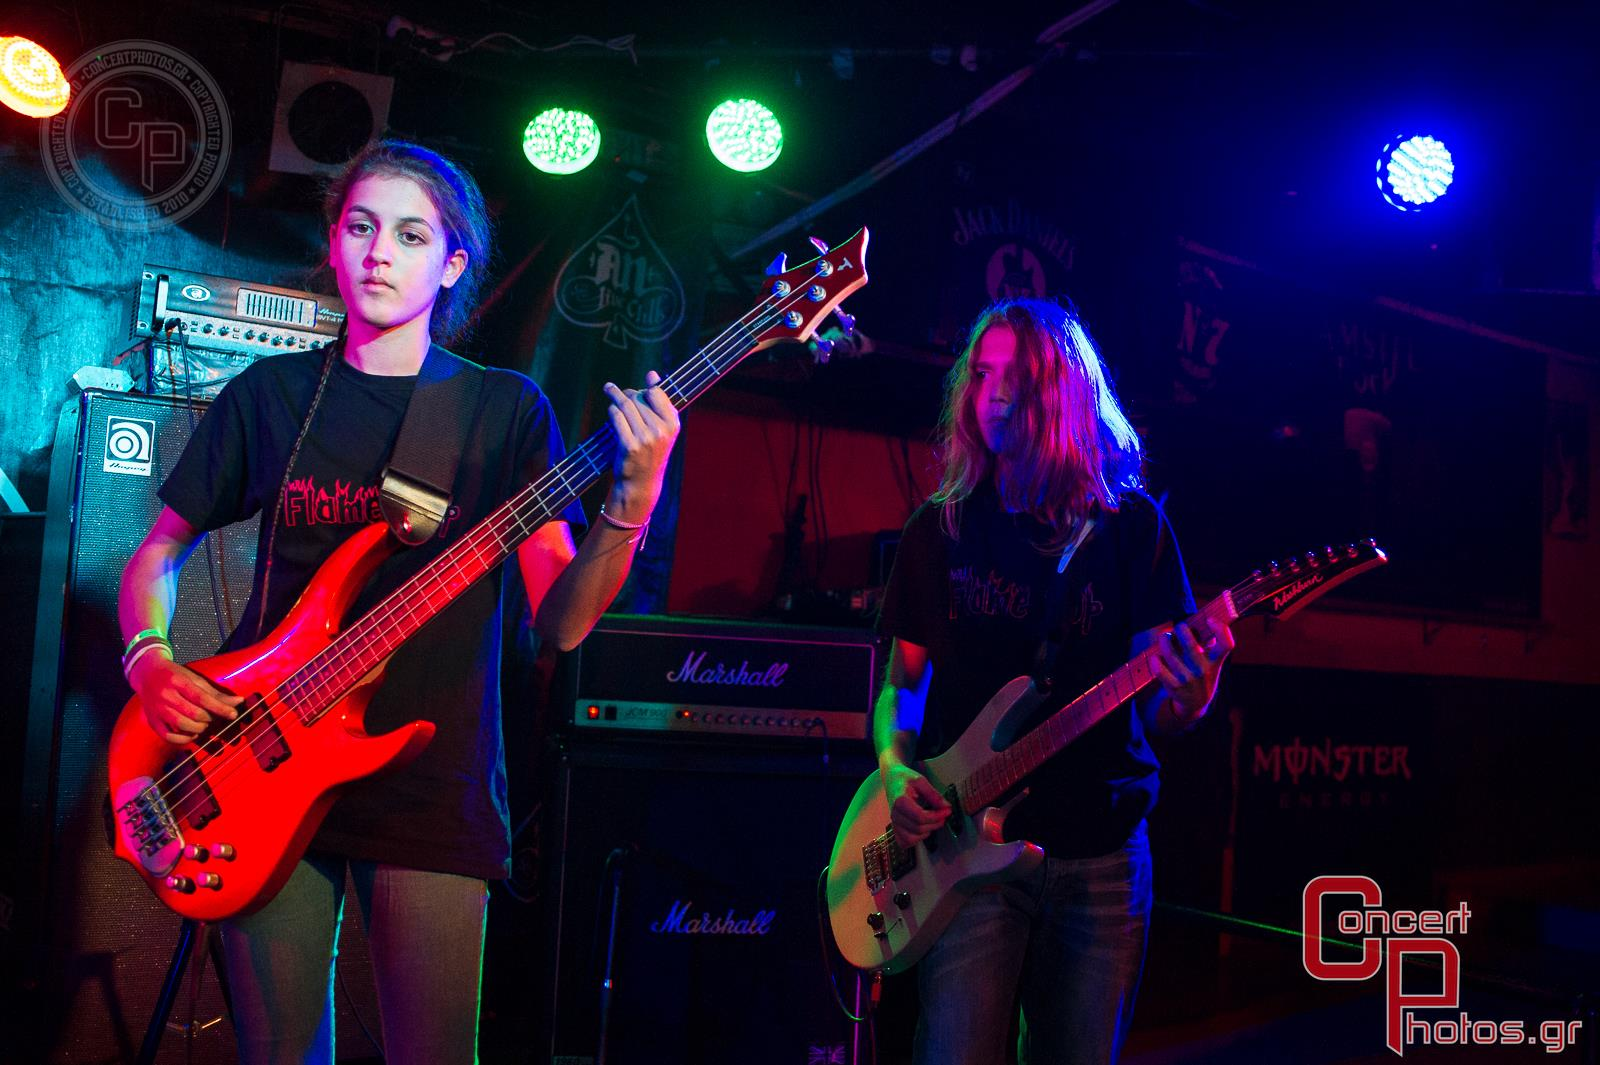 Battle Of The Bands Leg 1-Battle Of The Bands Leg 1 photographer:  - ConcertPhotos - 20141126_2256_59